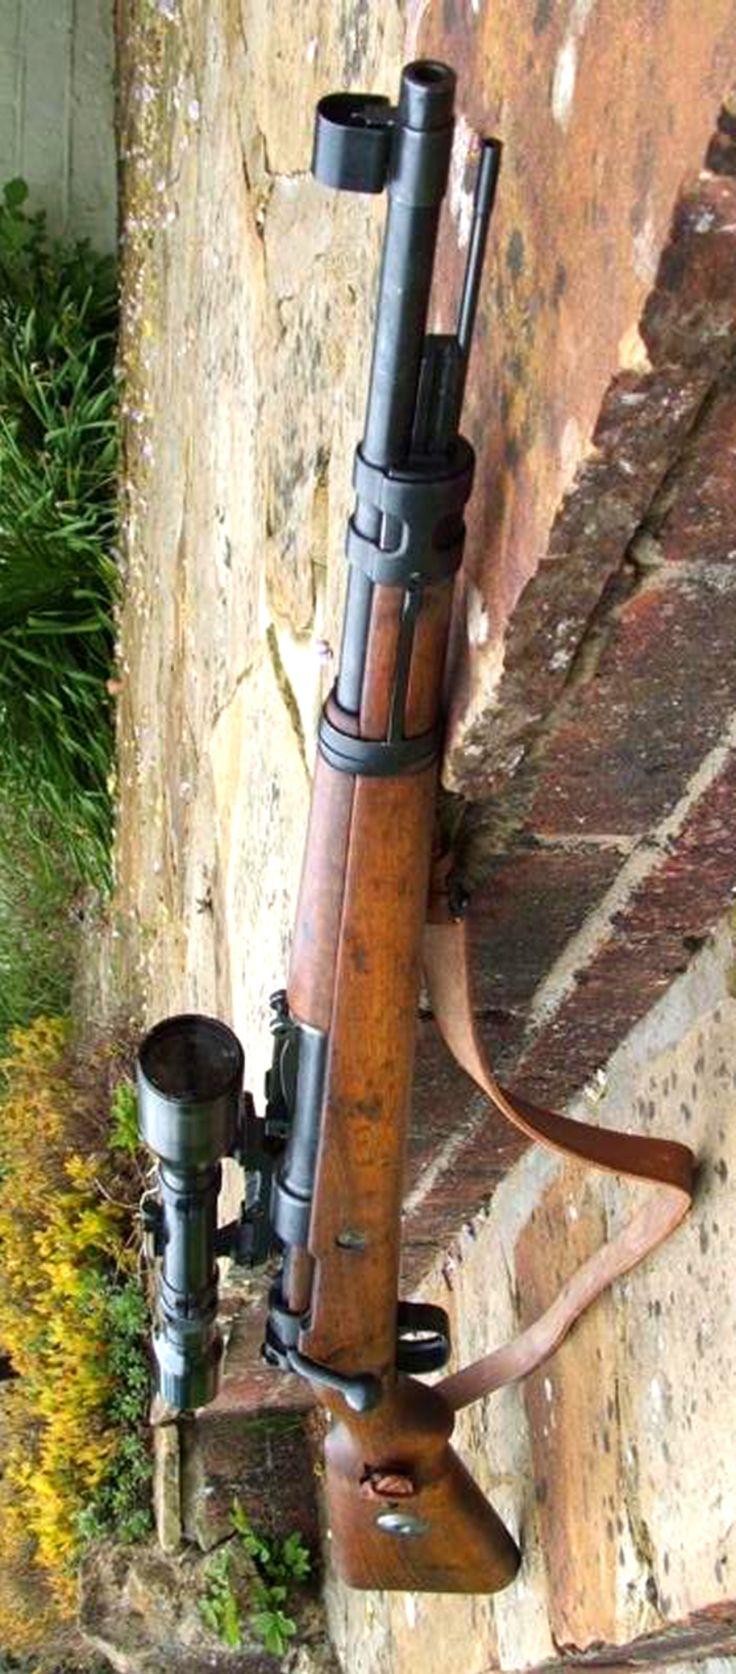 Карабина Маузер 98к с оптика / Mauser Karabiner 98k ( Kar98k/K98k )